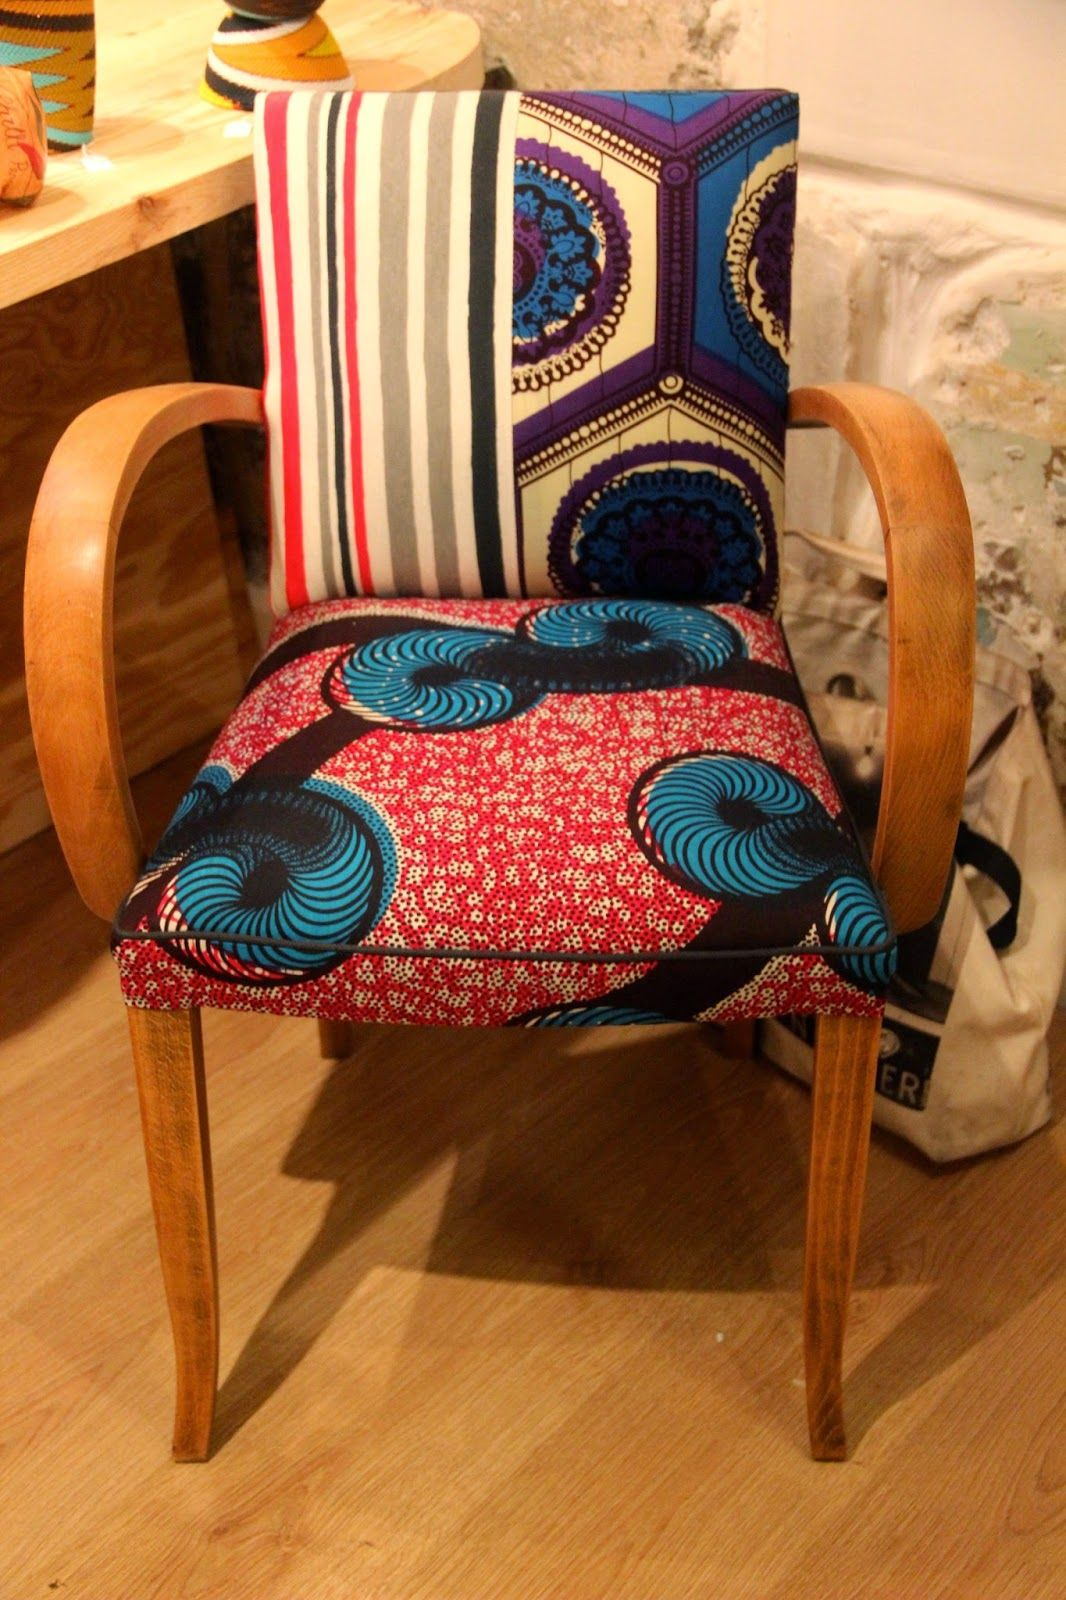 127 Best K tuoli images | Tuoli, Verhoilu, Nojatuoli